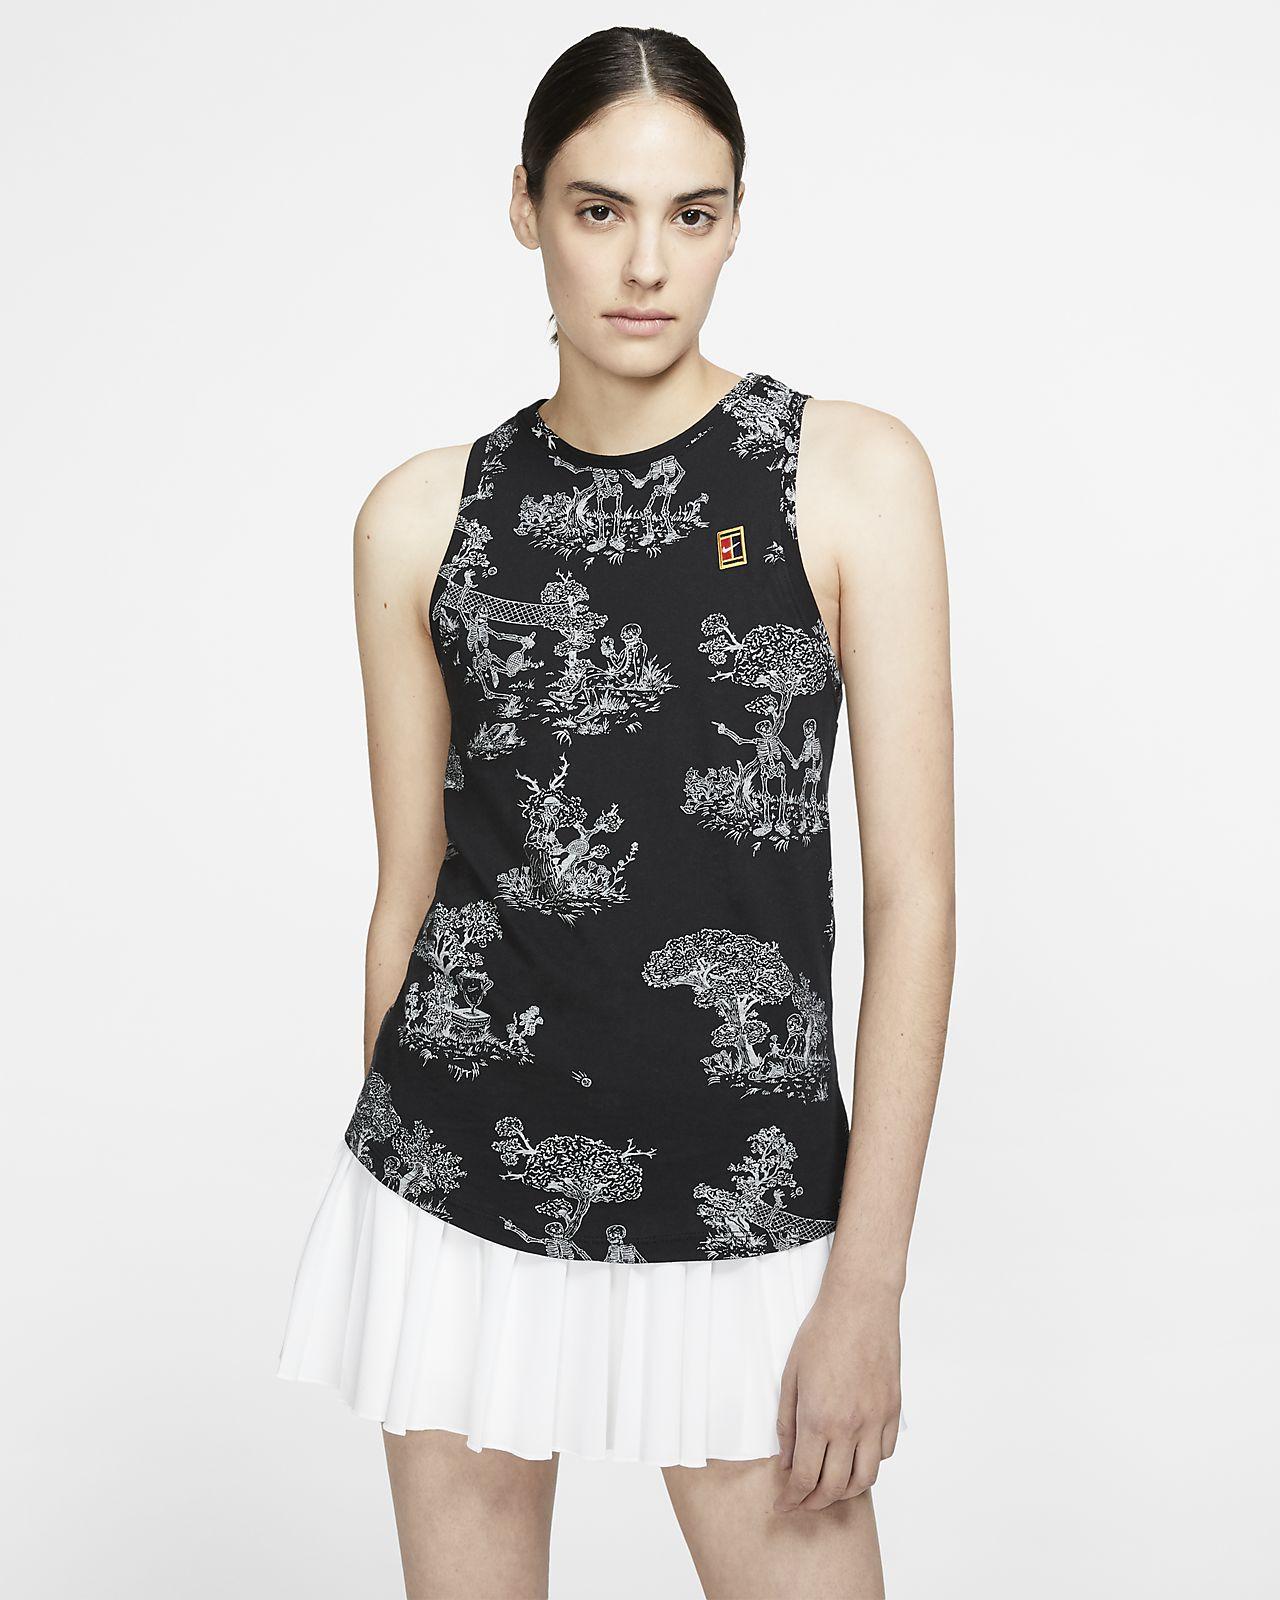 Camiseta de tirantes de tenis para mujer NikeCourt